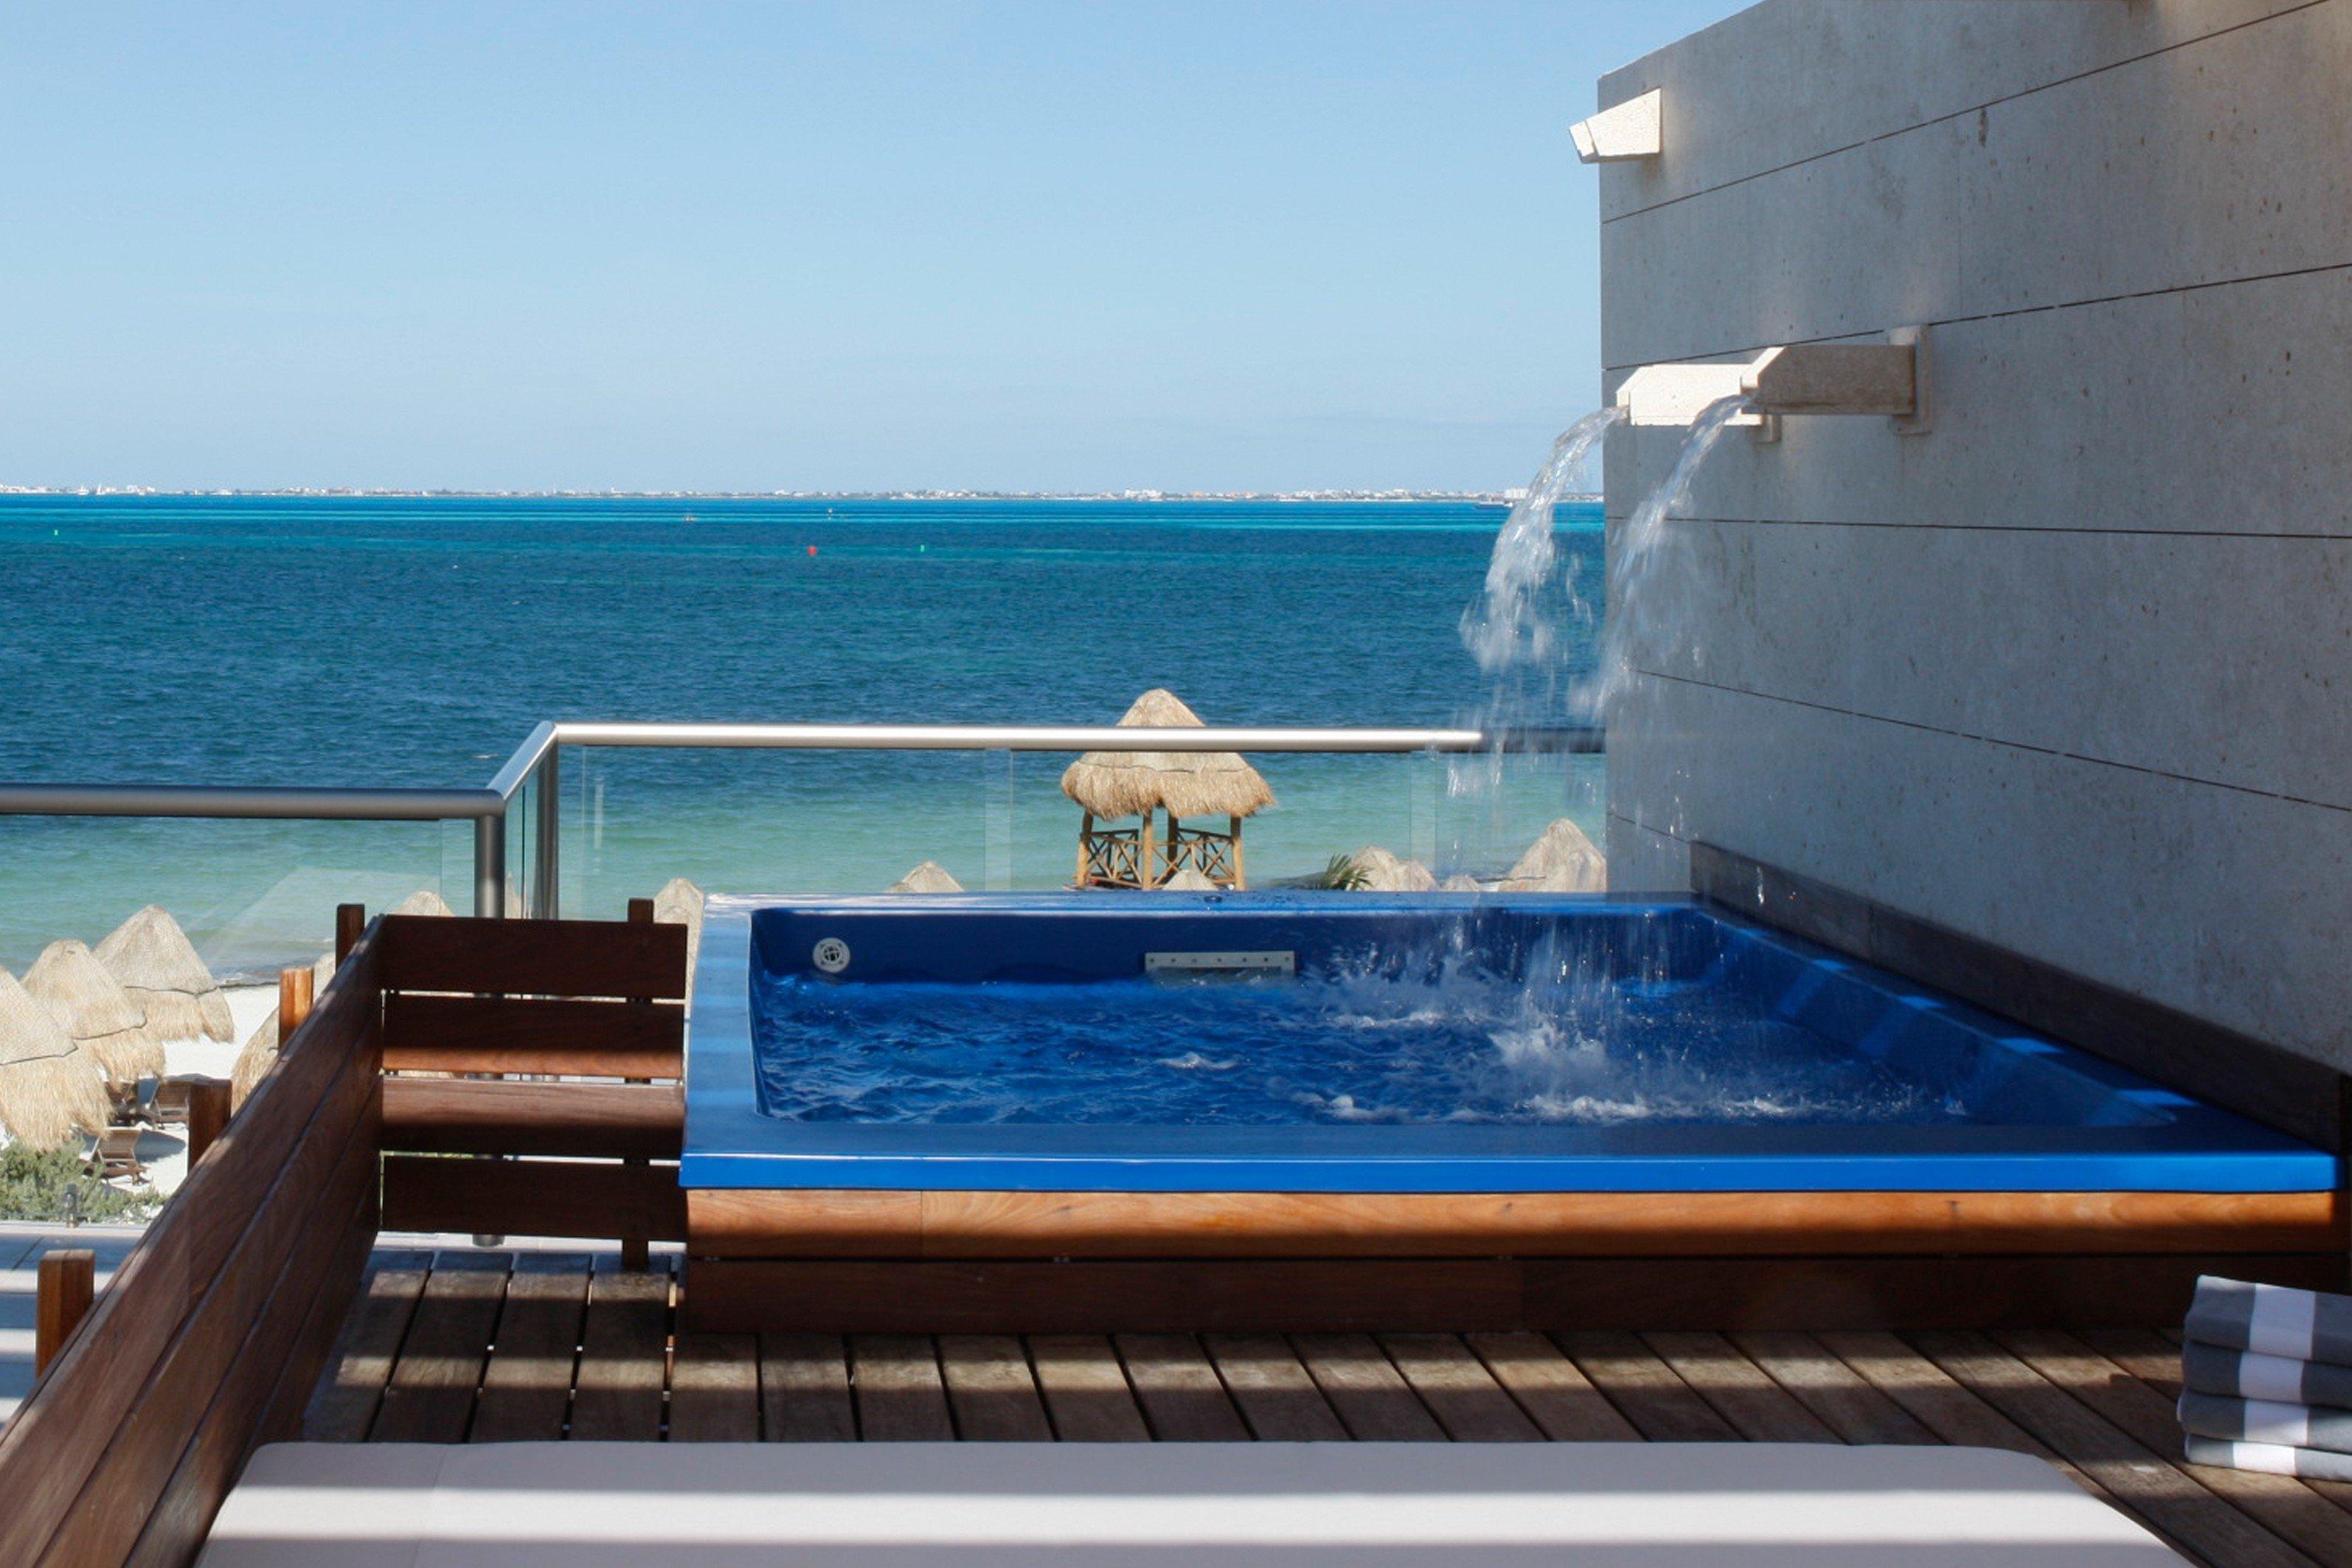 Hot tub Hot tub/Jacuzzi Luxury Modern Tropical Wellness sky water swimming pool leisure blue Sea overlooking